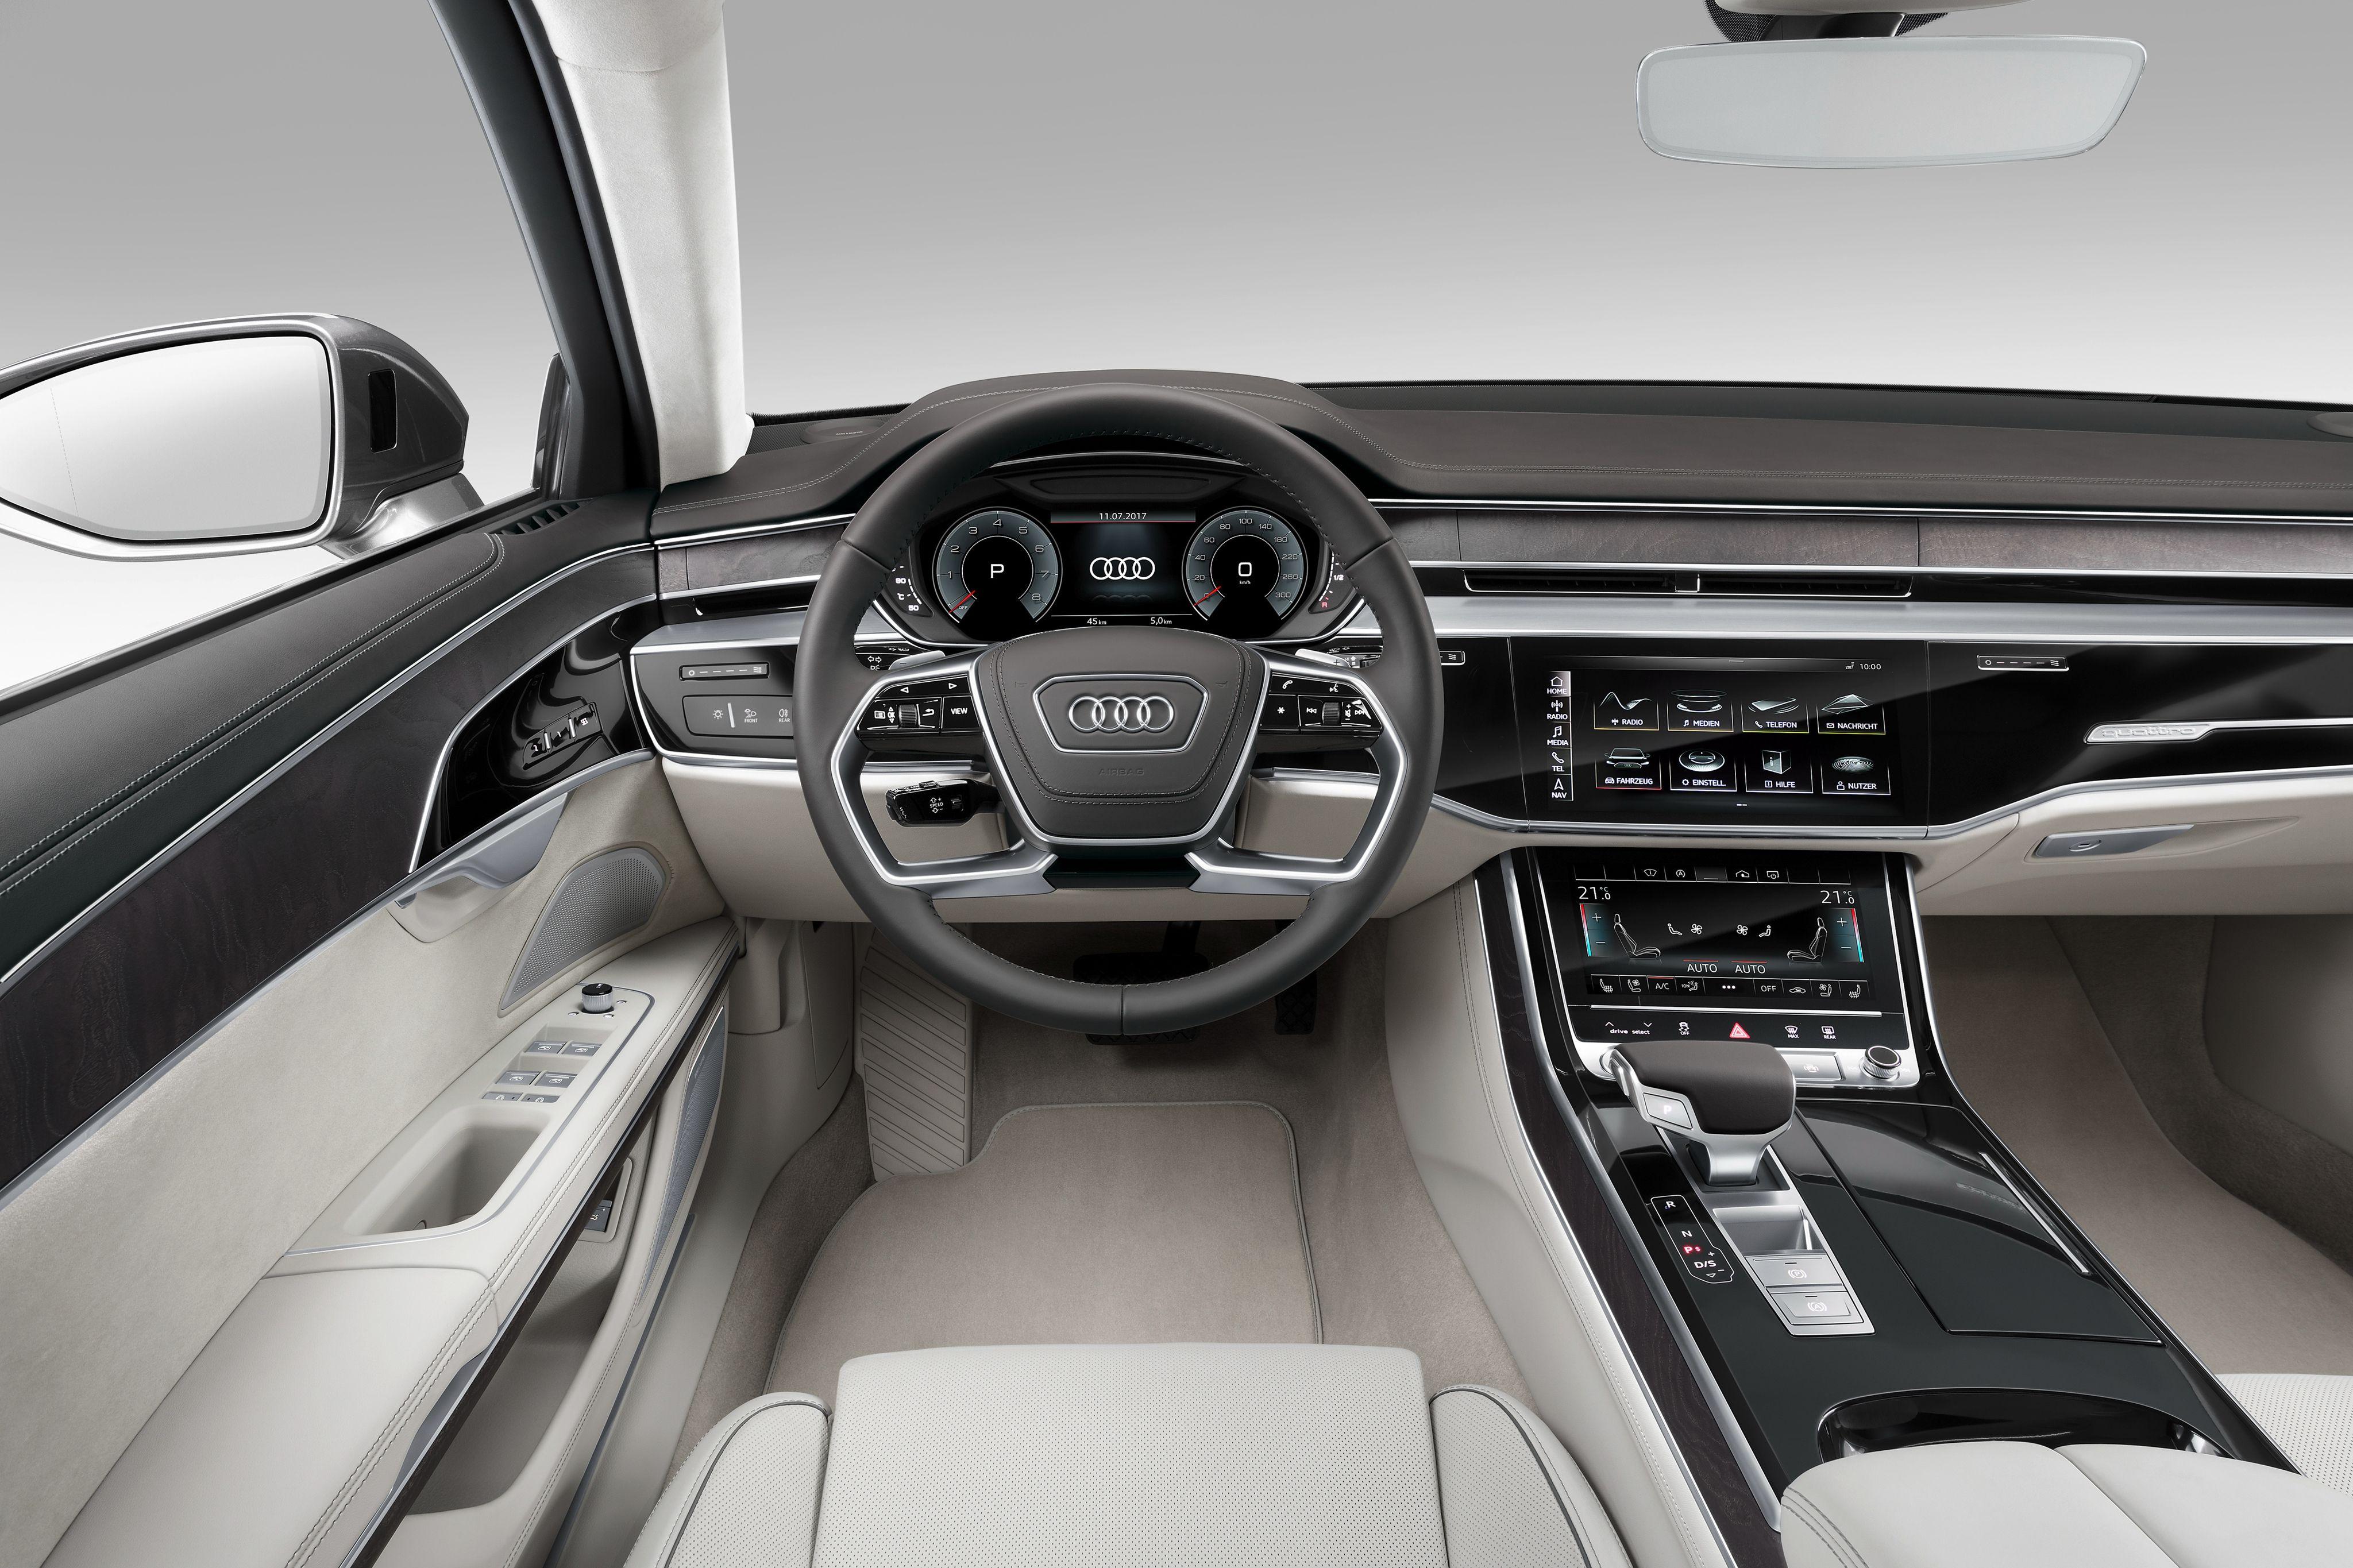 Audi A8 L 55 Tfsi Quattro Worldwide D5 2017 Pr Audi A8 Audi First Drive